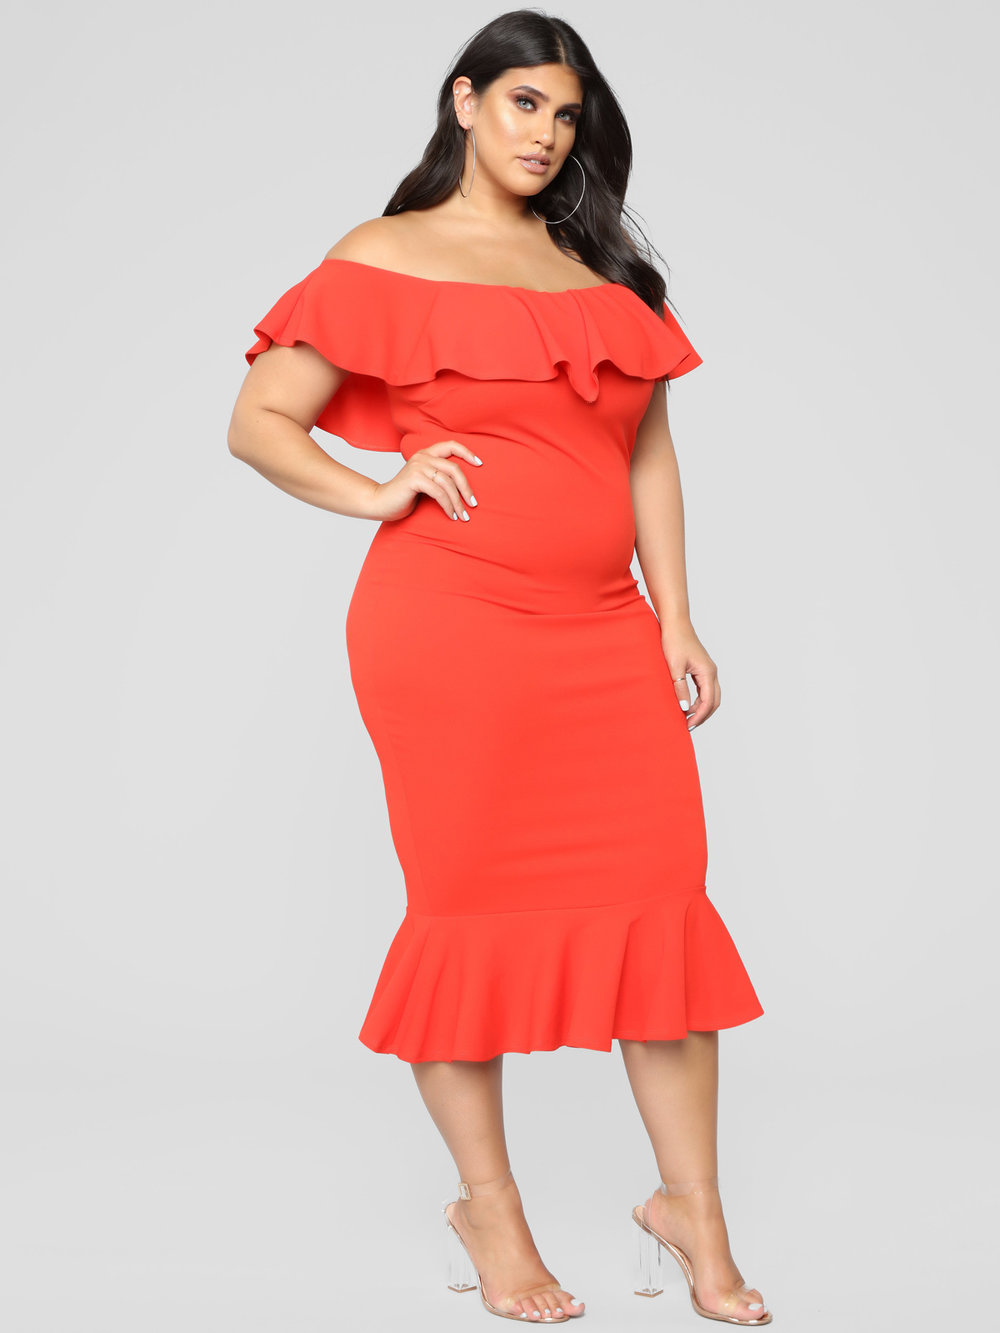 curvy-con-dress-22.jpg